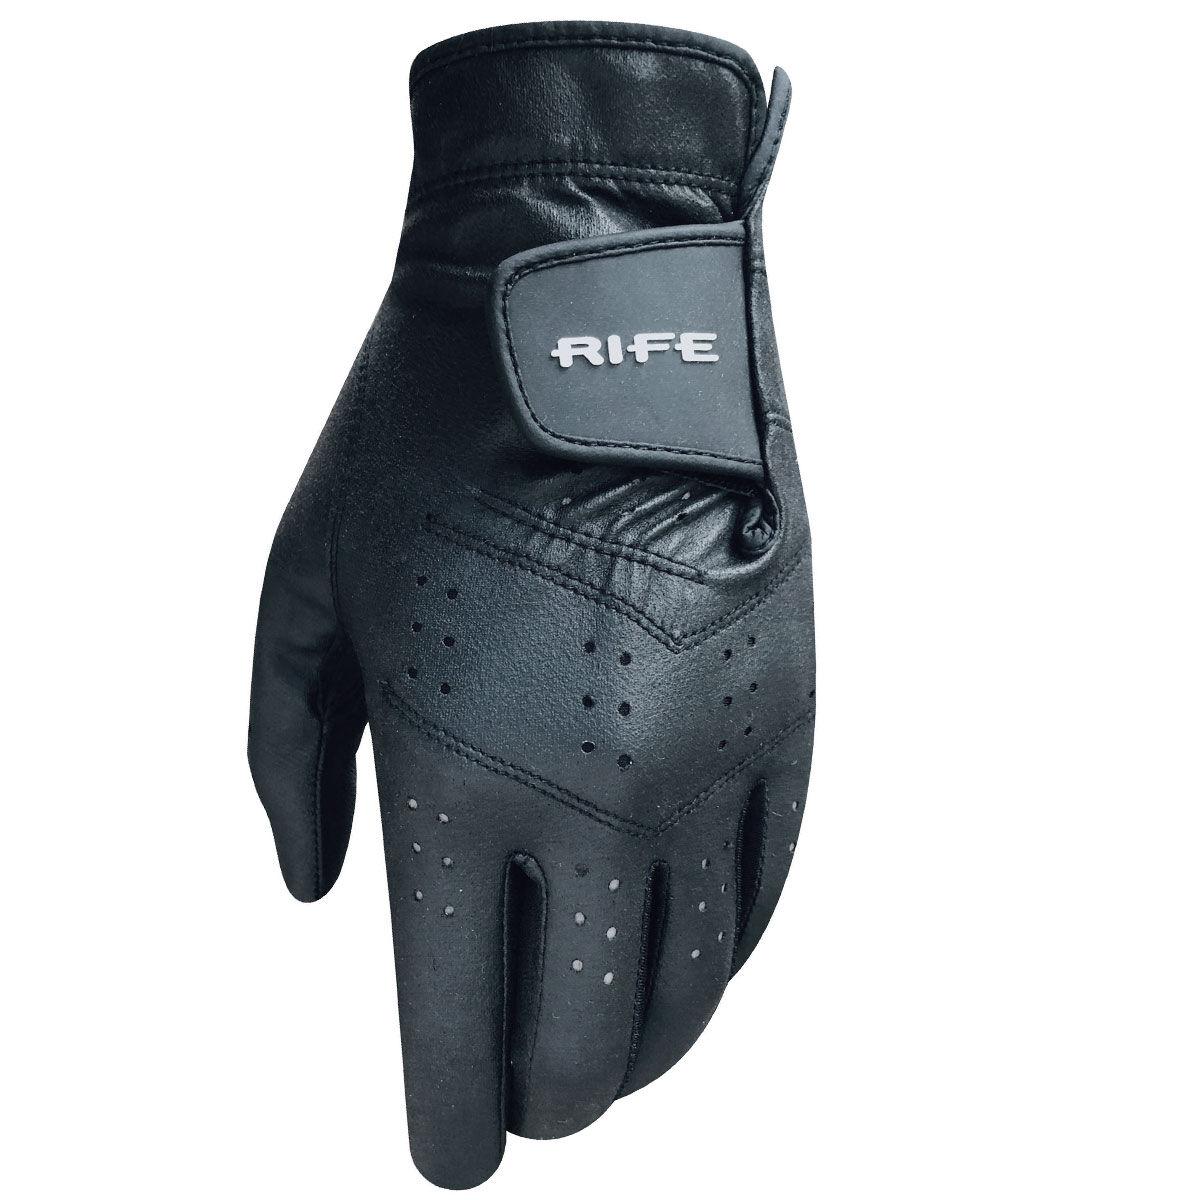 Rife Black RX2 All Weather Left Hand Golf Glove, Size: XL   American Golf   American Golf